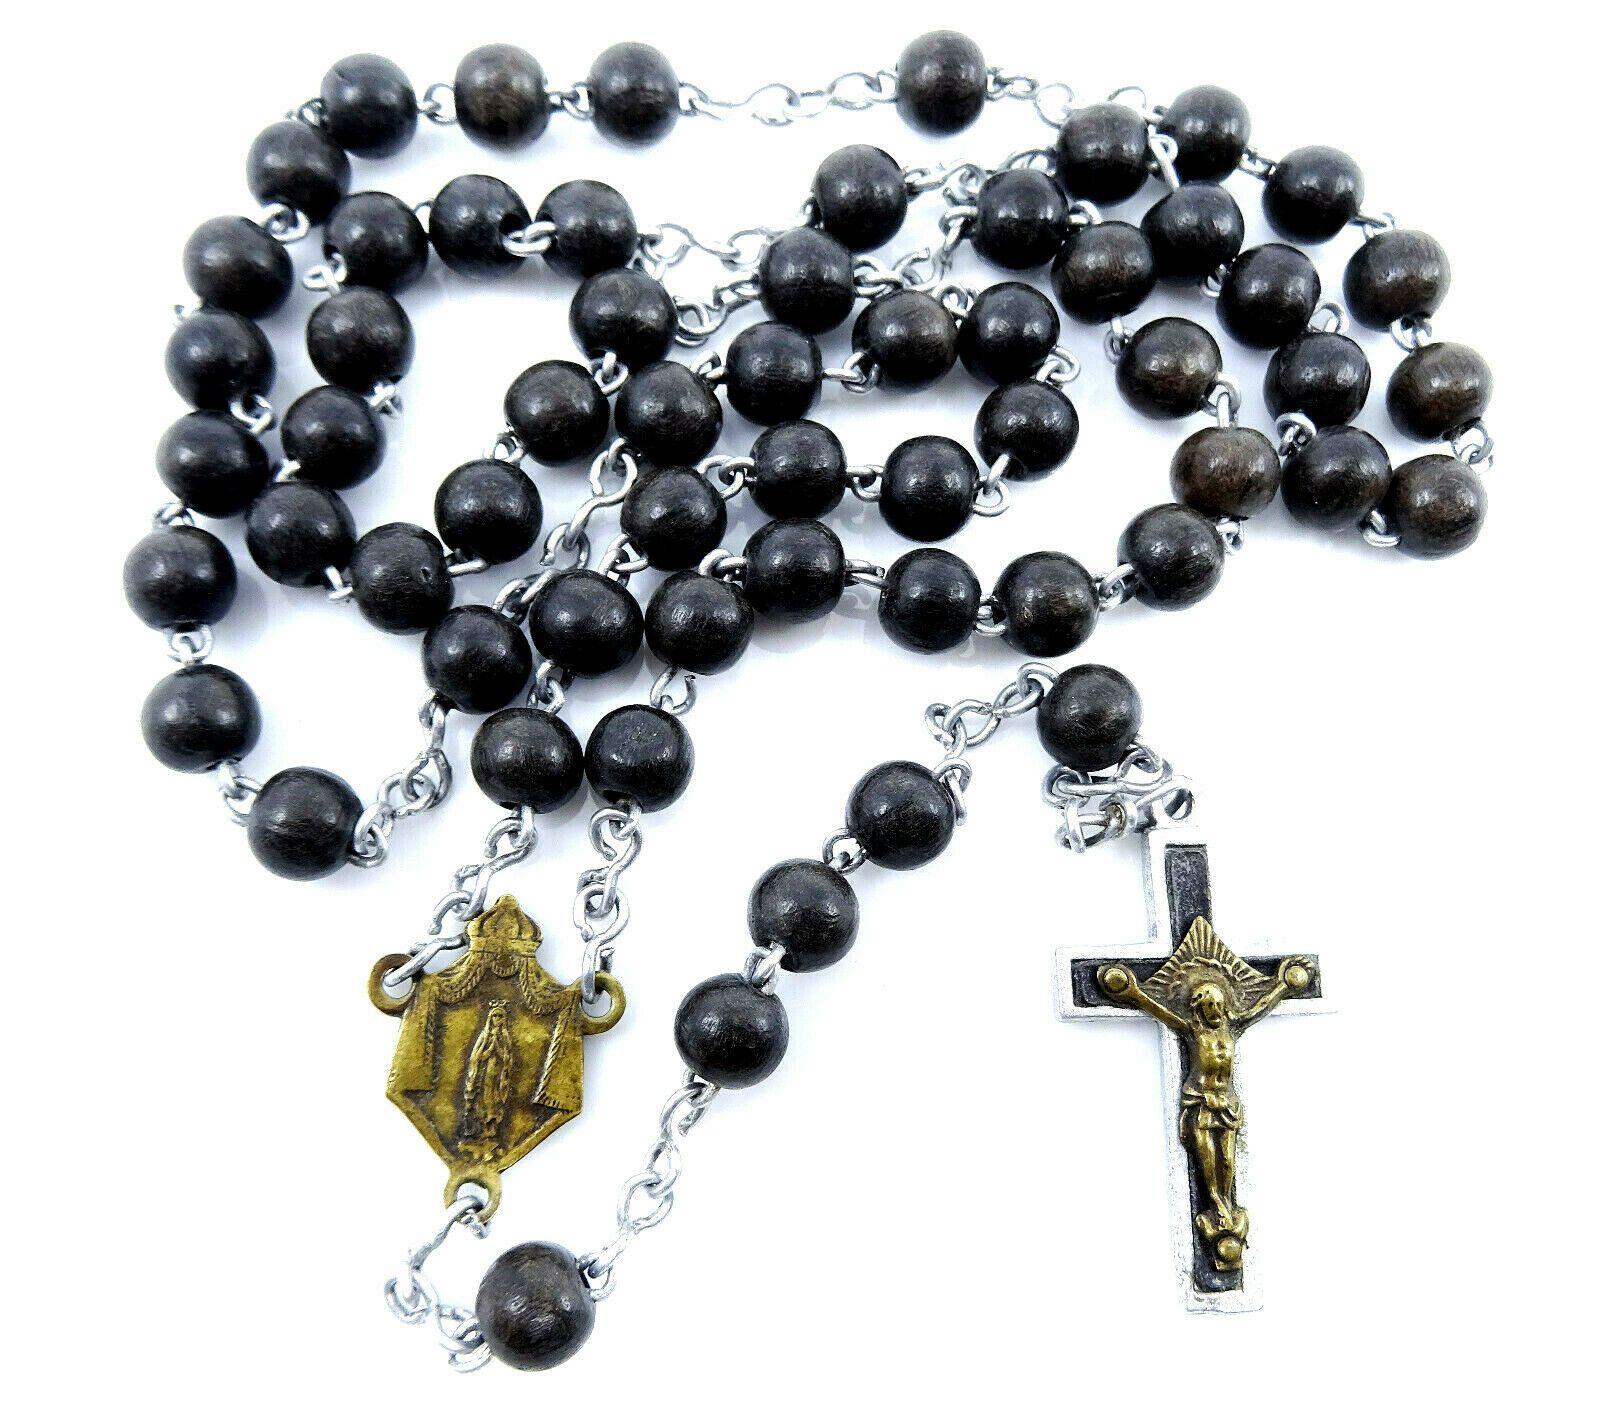 Vintage Catholic Rosary Our Lady of Lourdes Unusual Medal Black Beads #catholicrosaries